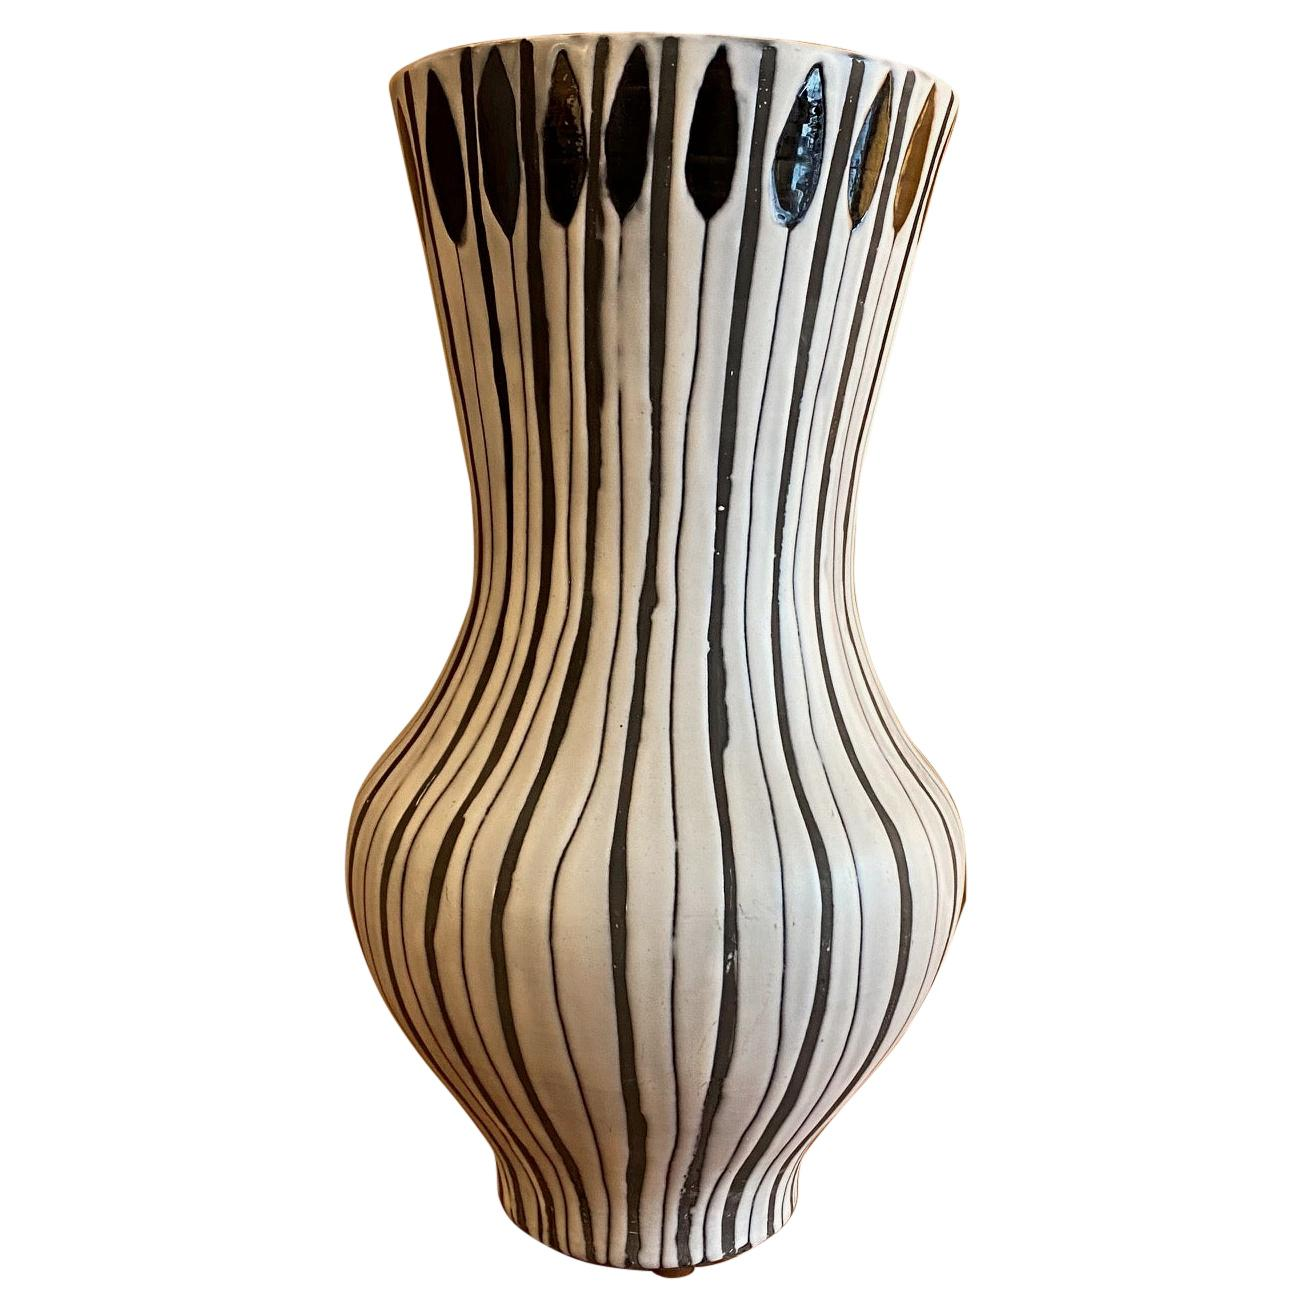 Ceramic Vase by Roger Capron, France, 1960s